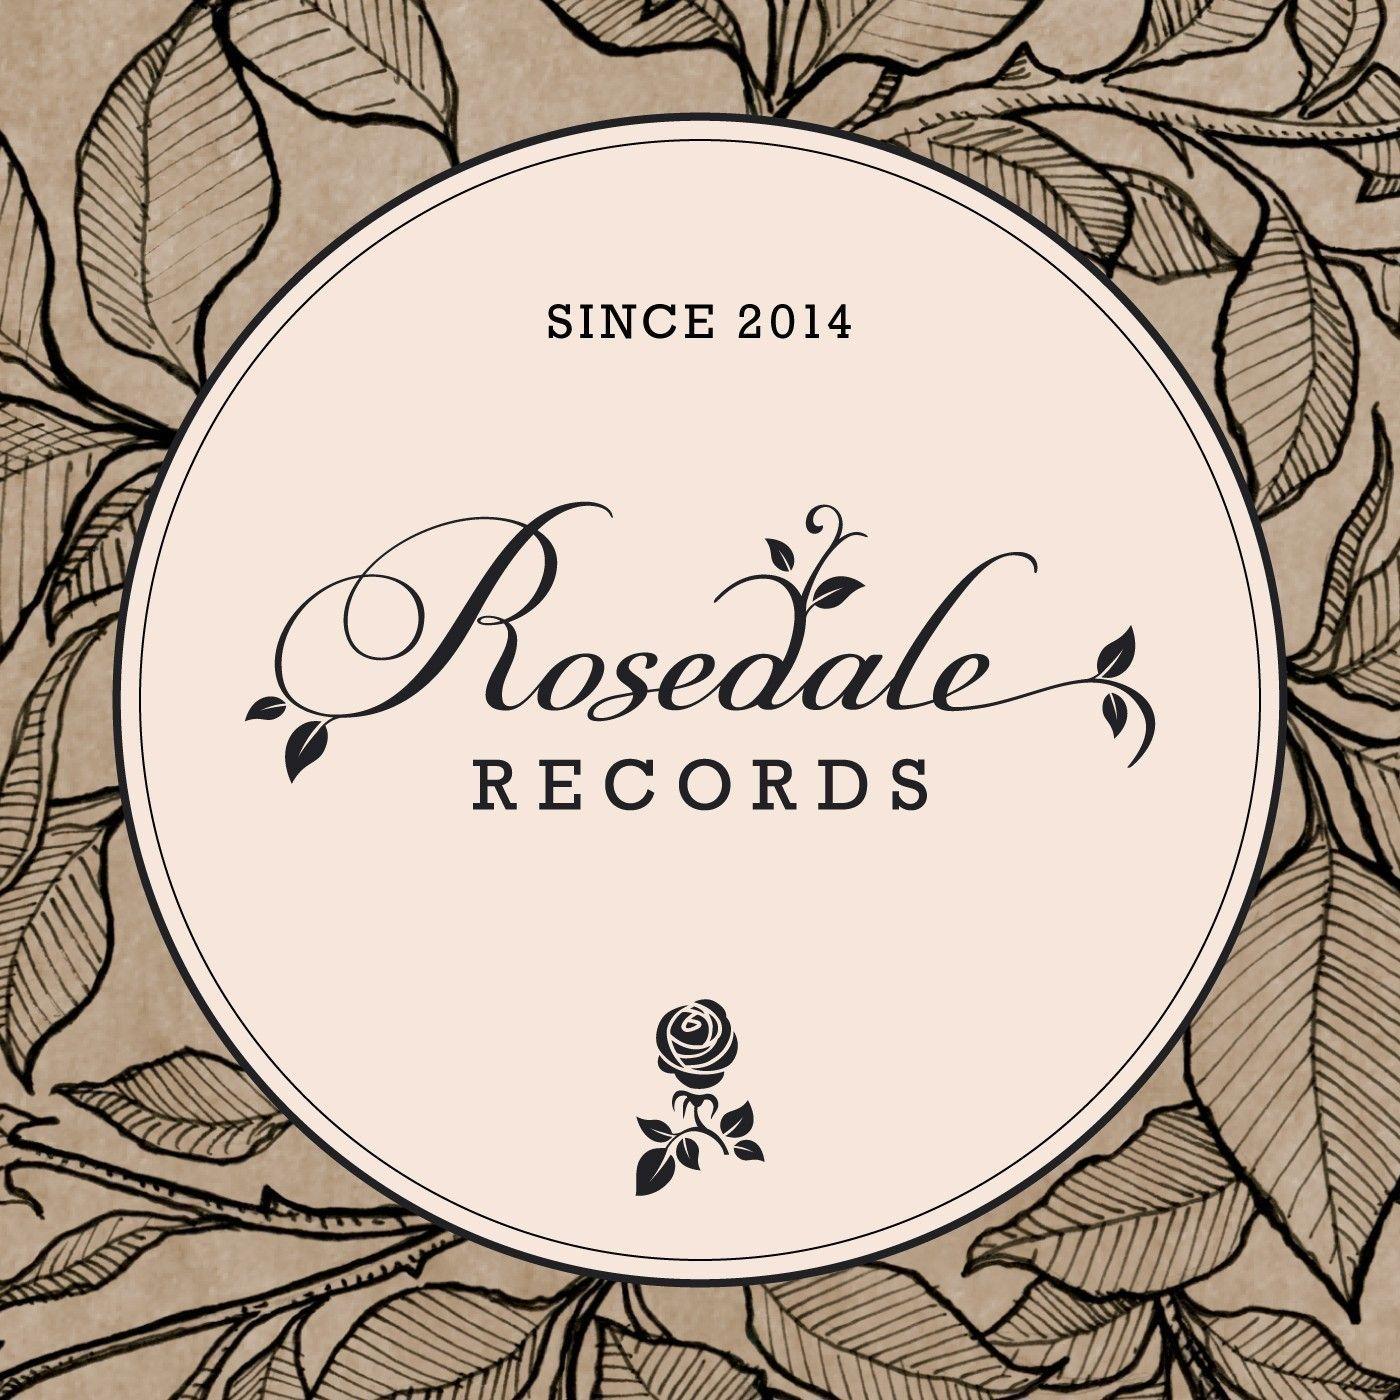 rosedale-rose001-ep.jpg